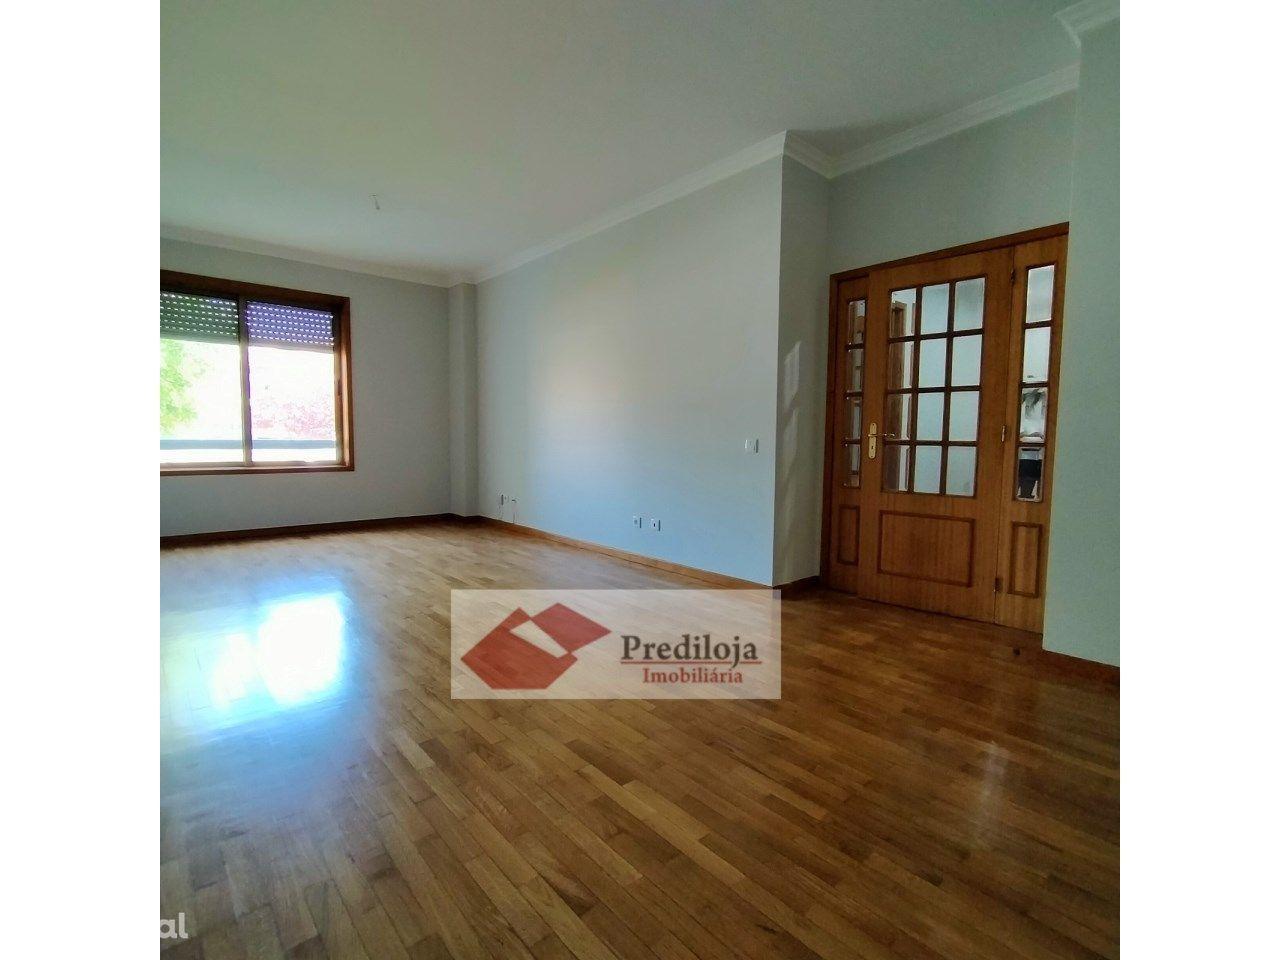 Apartamento T2 c/ Suite, Lugar gar., Caulinos, Sr.ª. Hora